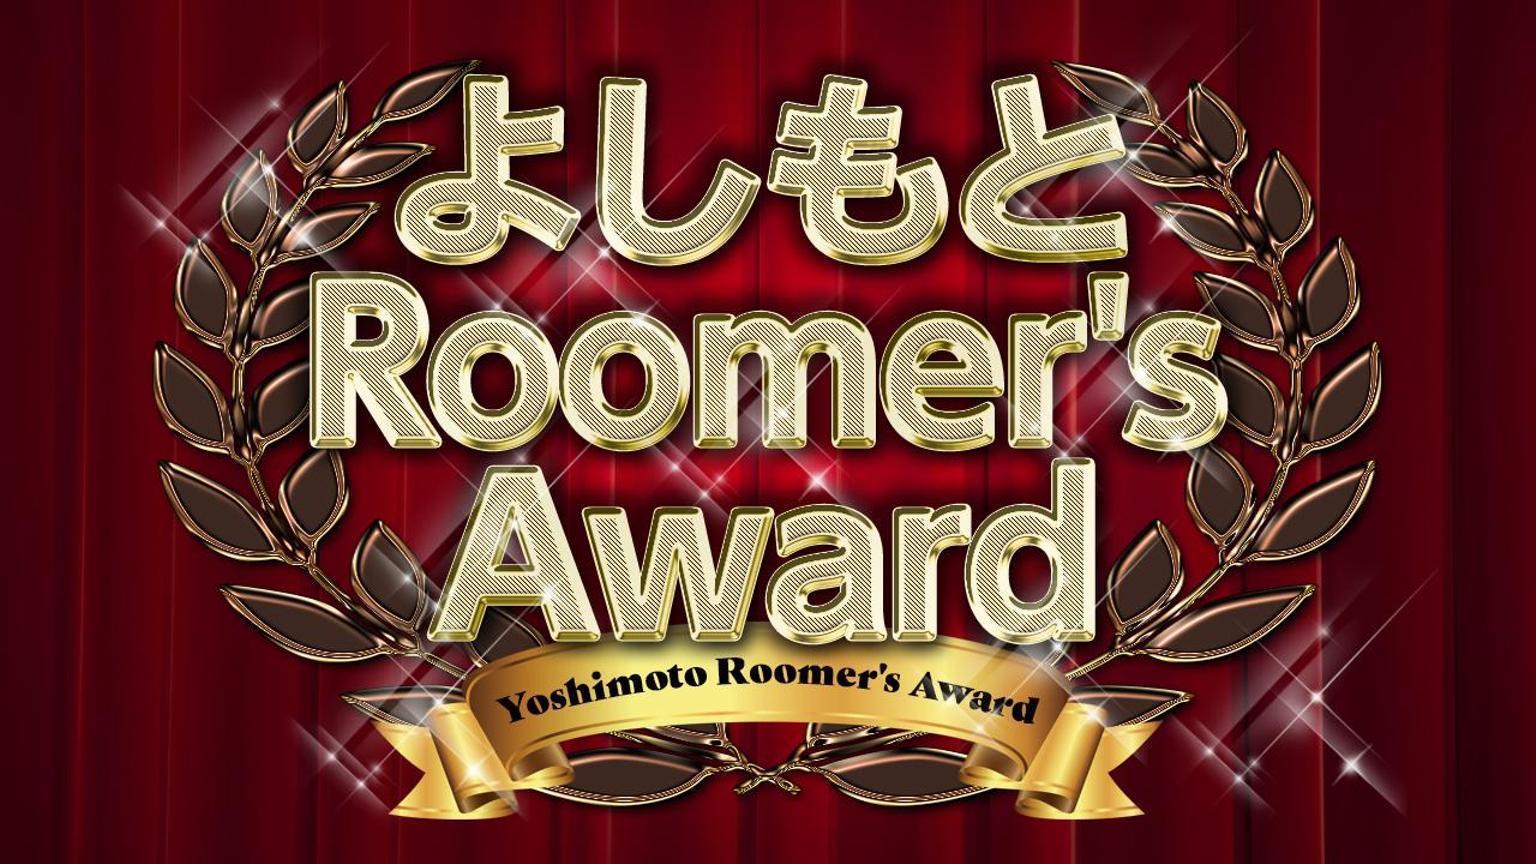 http://news.yoshimoto.co.jp/20181130130327-7db12337ad76696660d0cef6f38b8022f93db539.jpeg